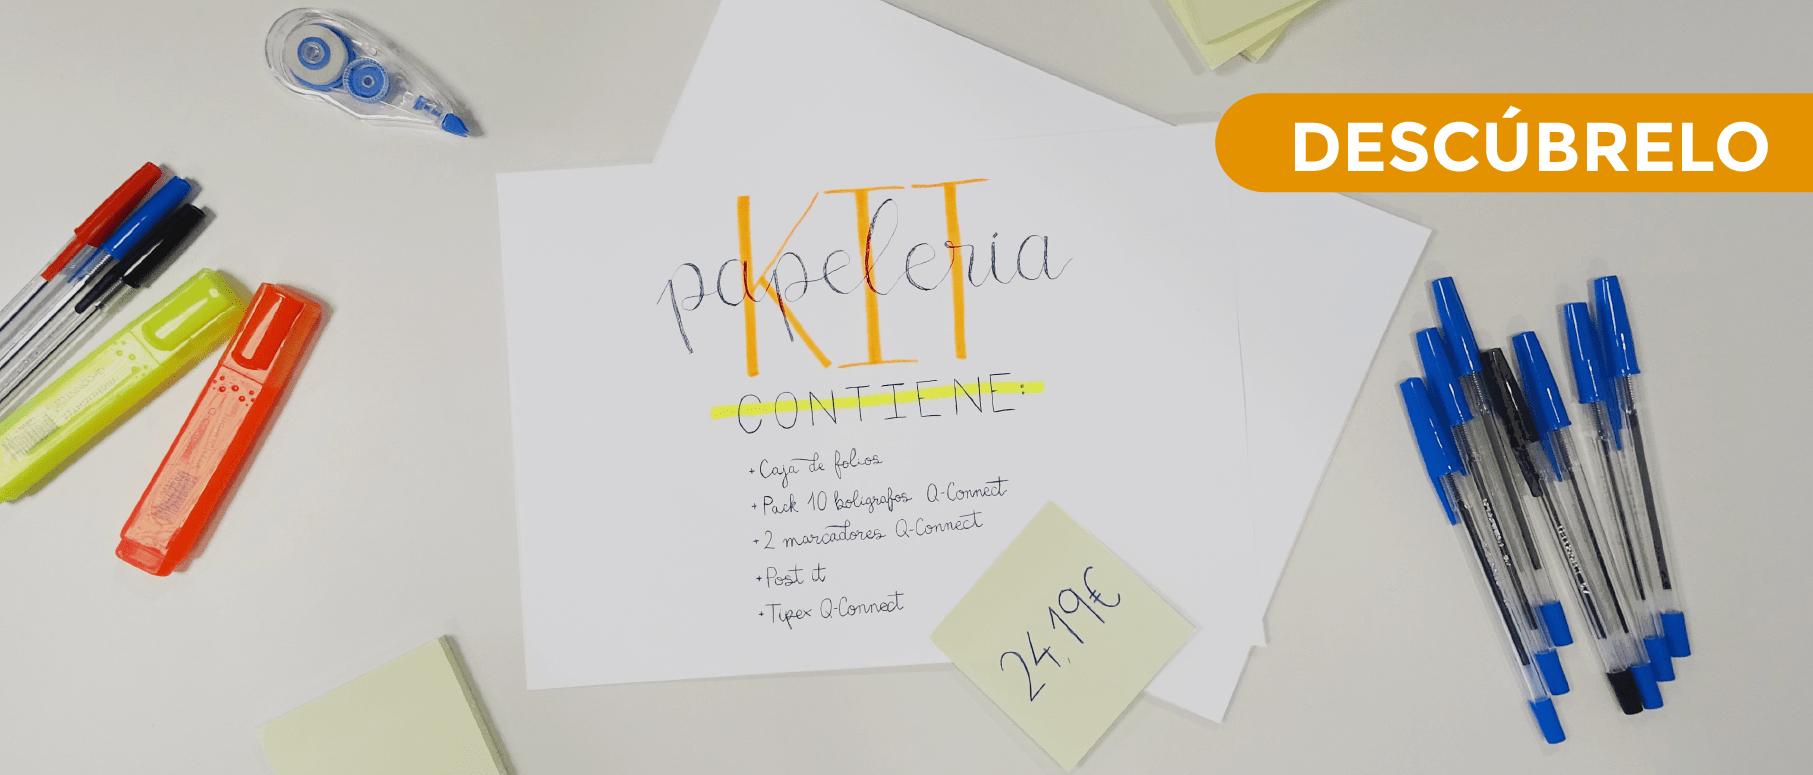 Banner Ecommerce Ecotisa Kit papeleria